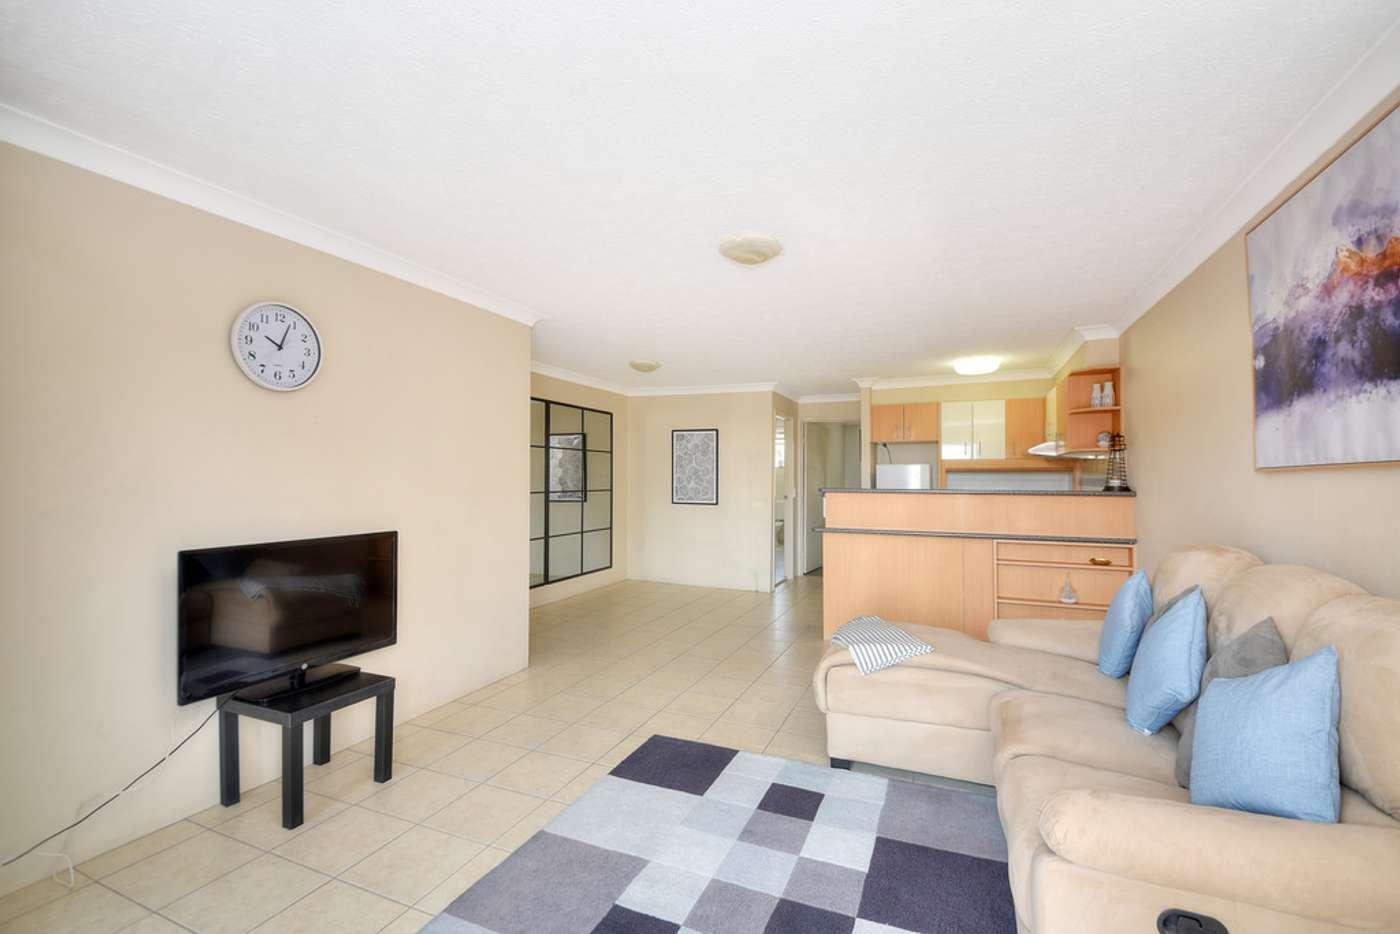 Sixth view of Homely apartment listing, 5/26 Albatross Avenue, Mermaid Beach QLD 4218